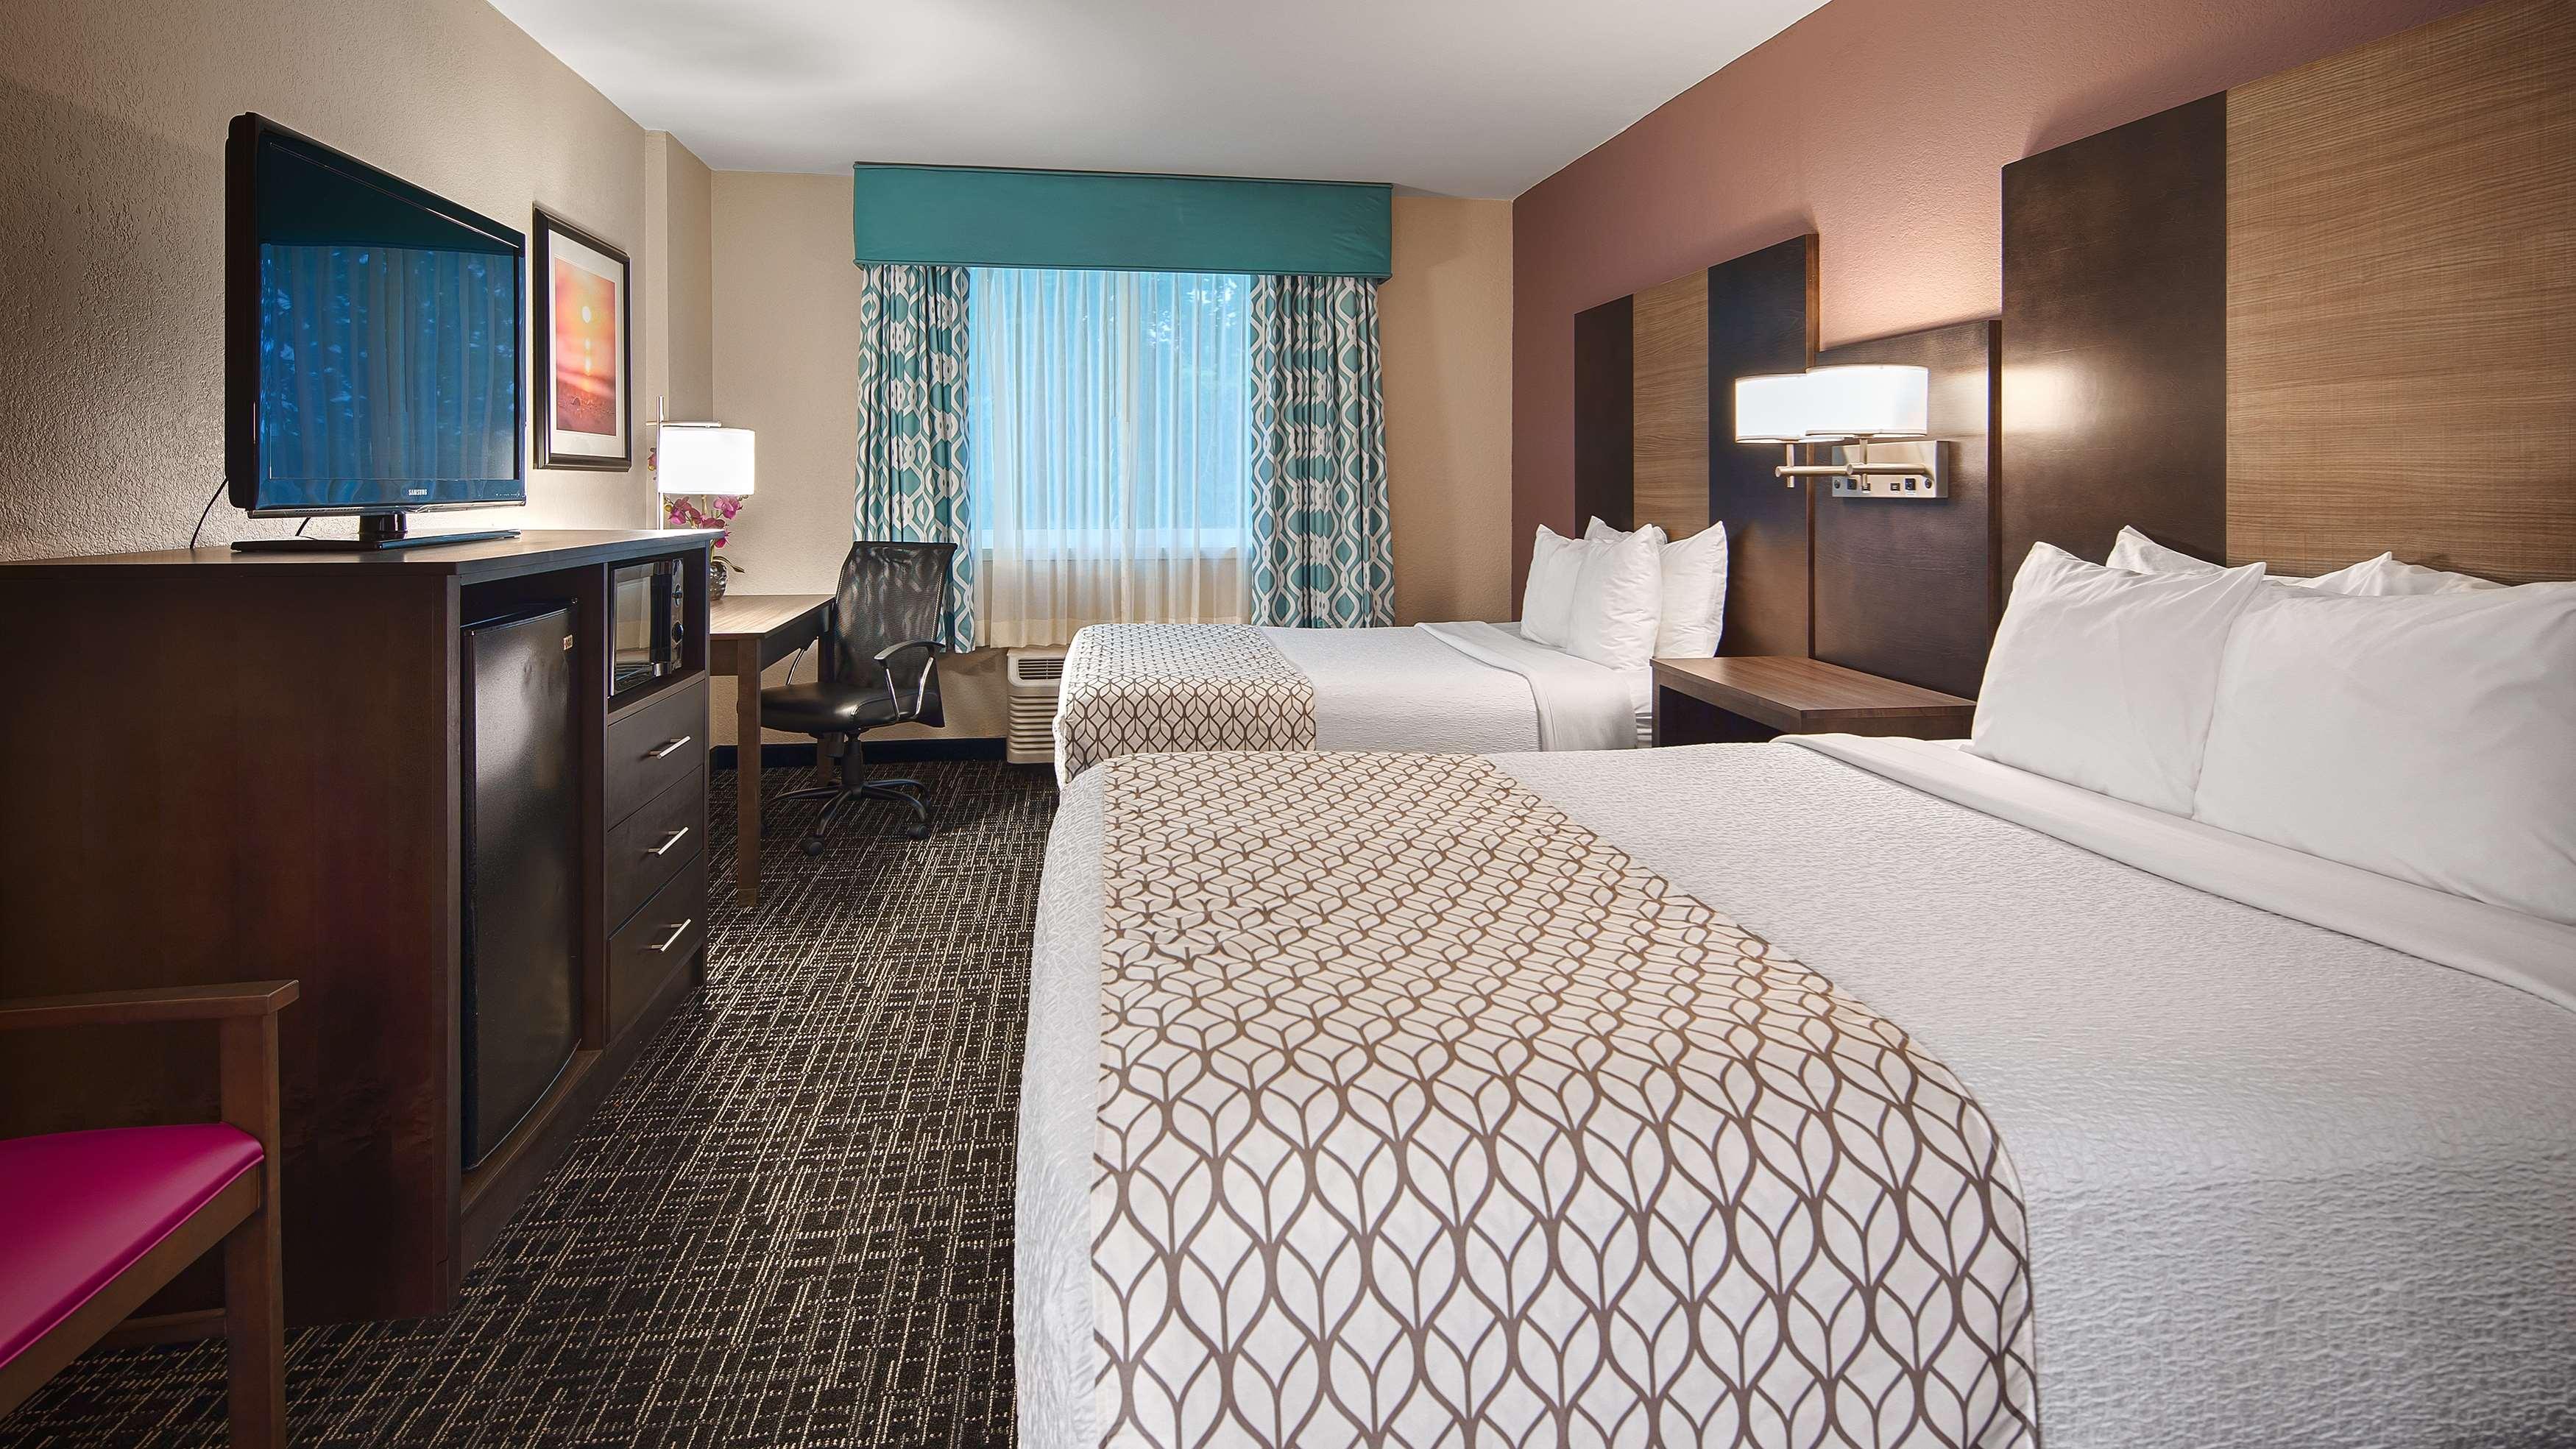 Best Western Fort Myers Inn & Suites image 15